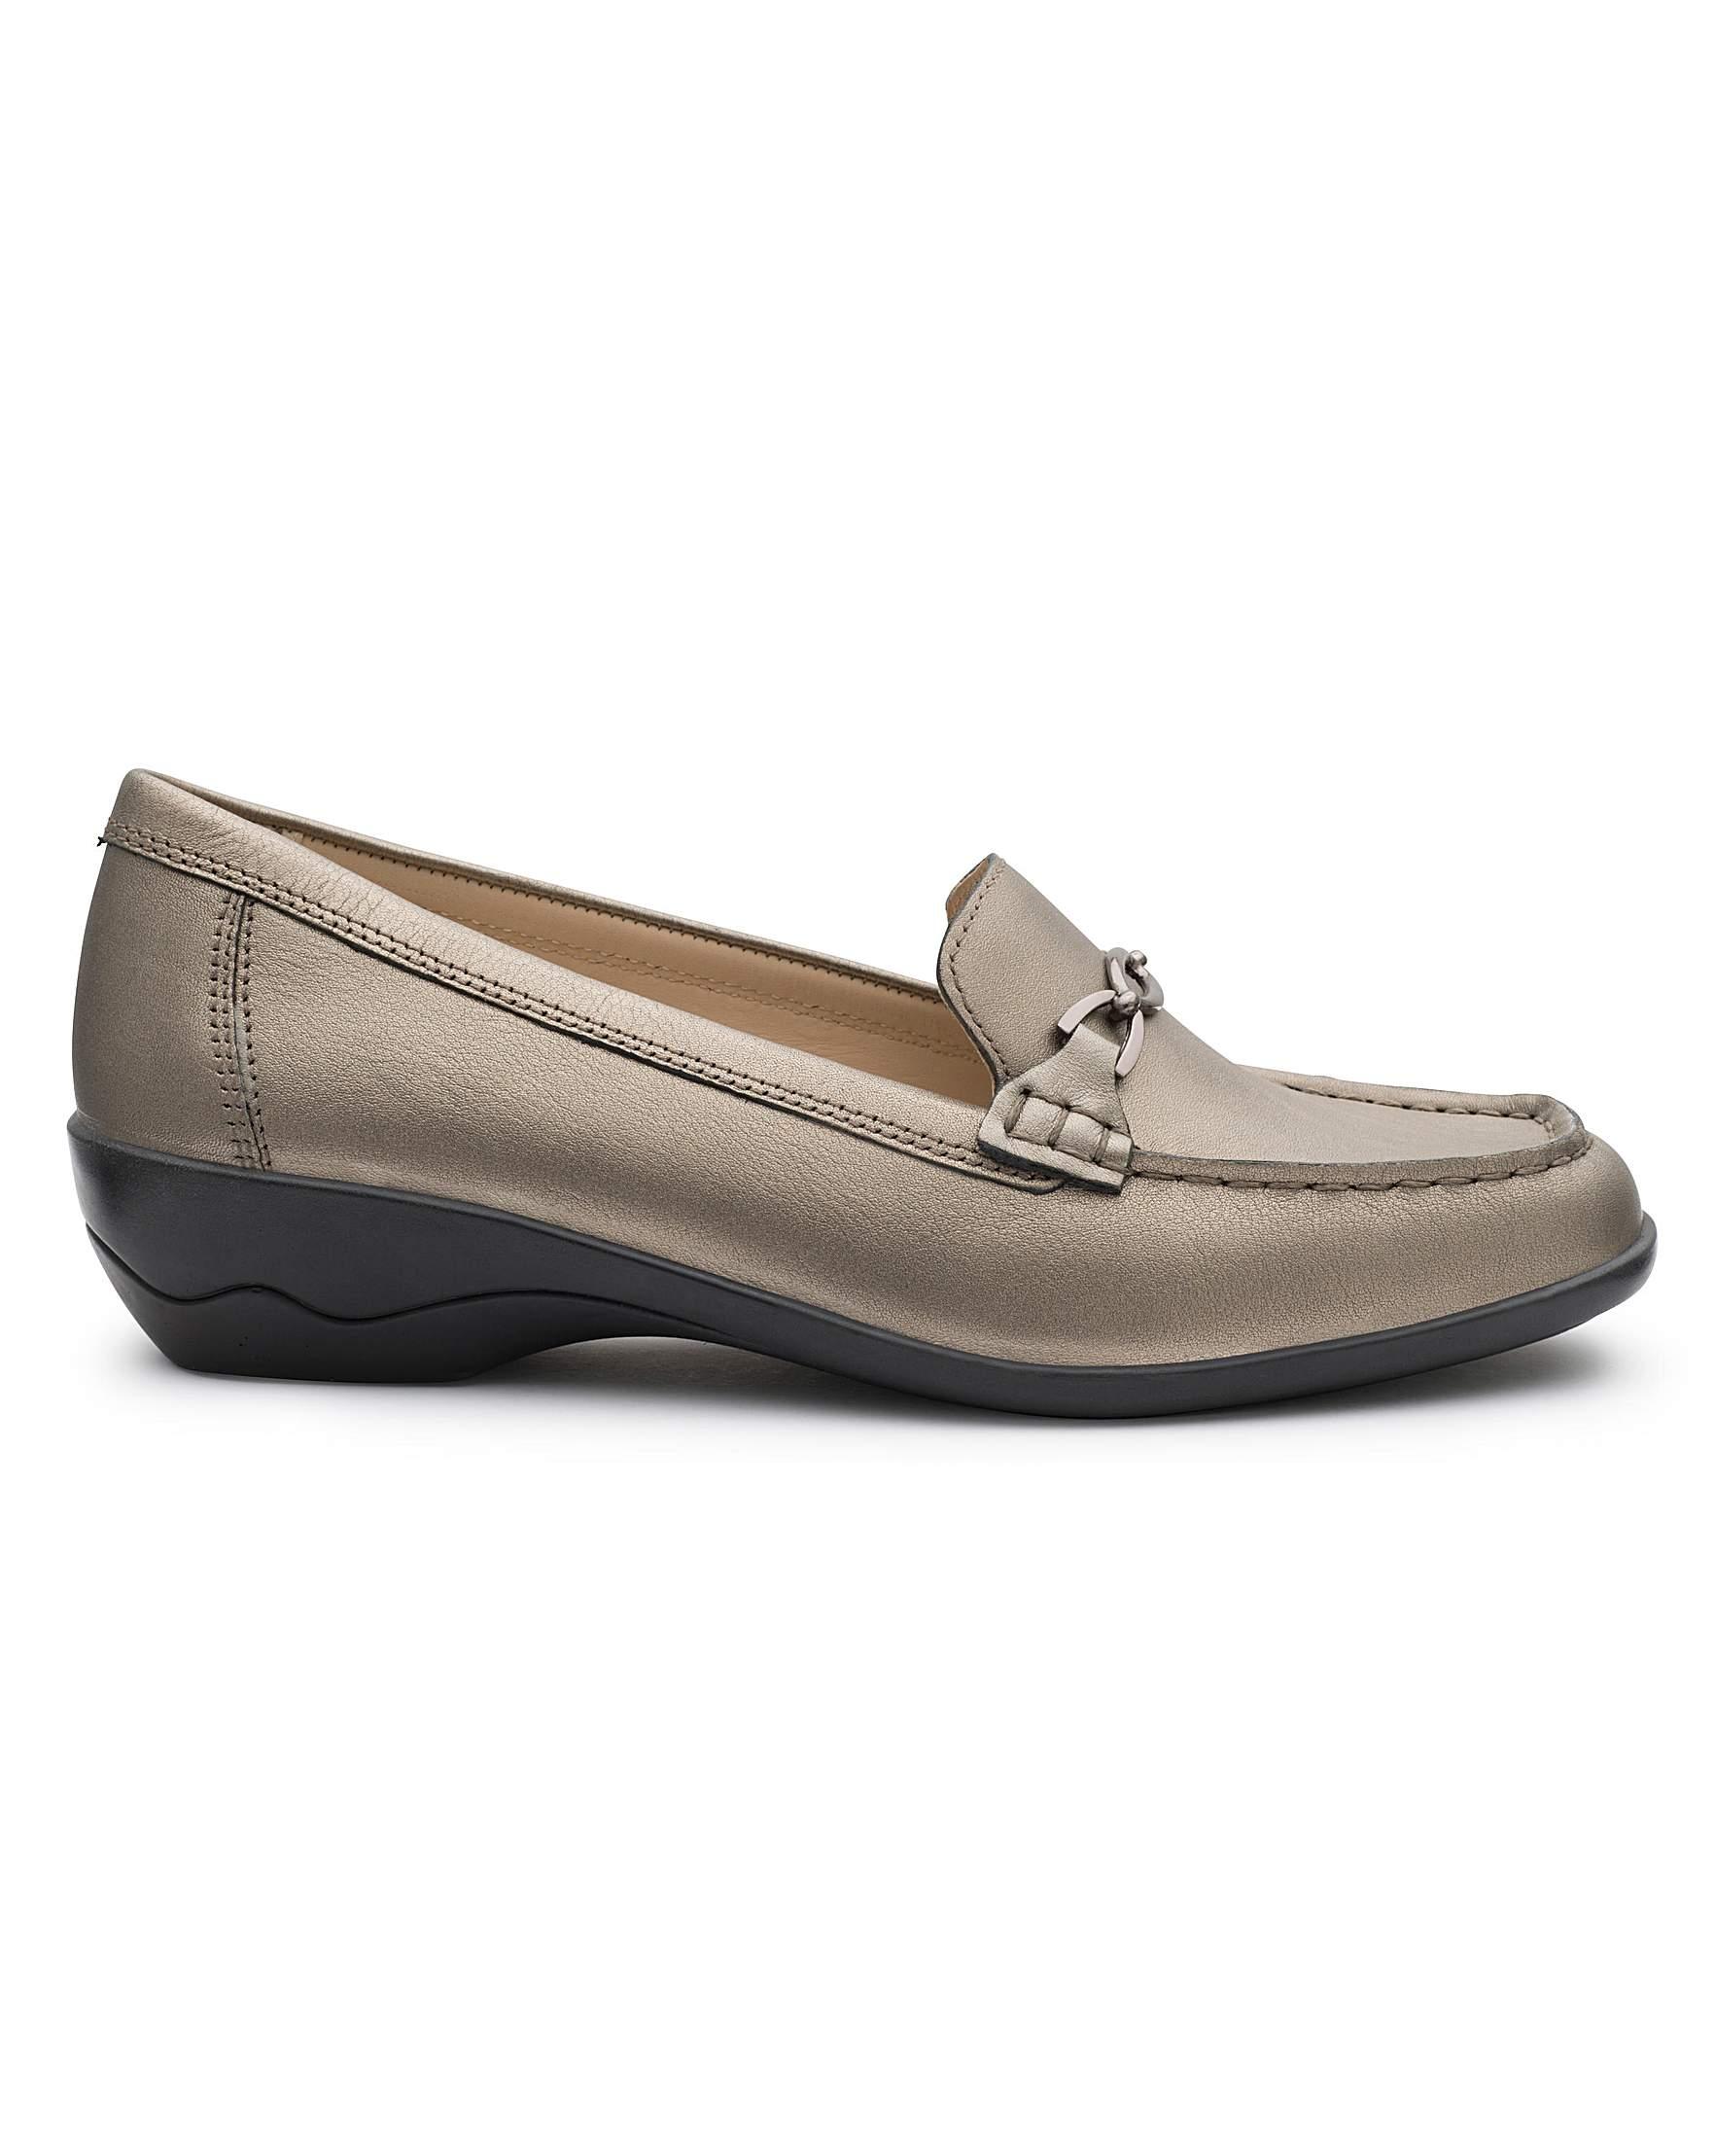 d09c0f9f879 Padders Ellen Shoe